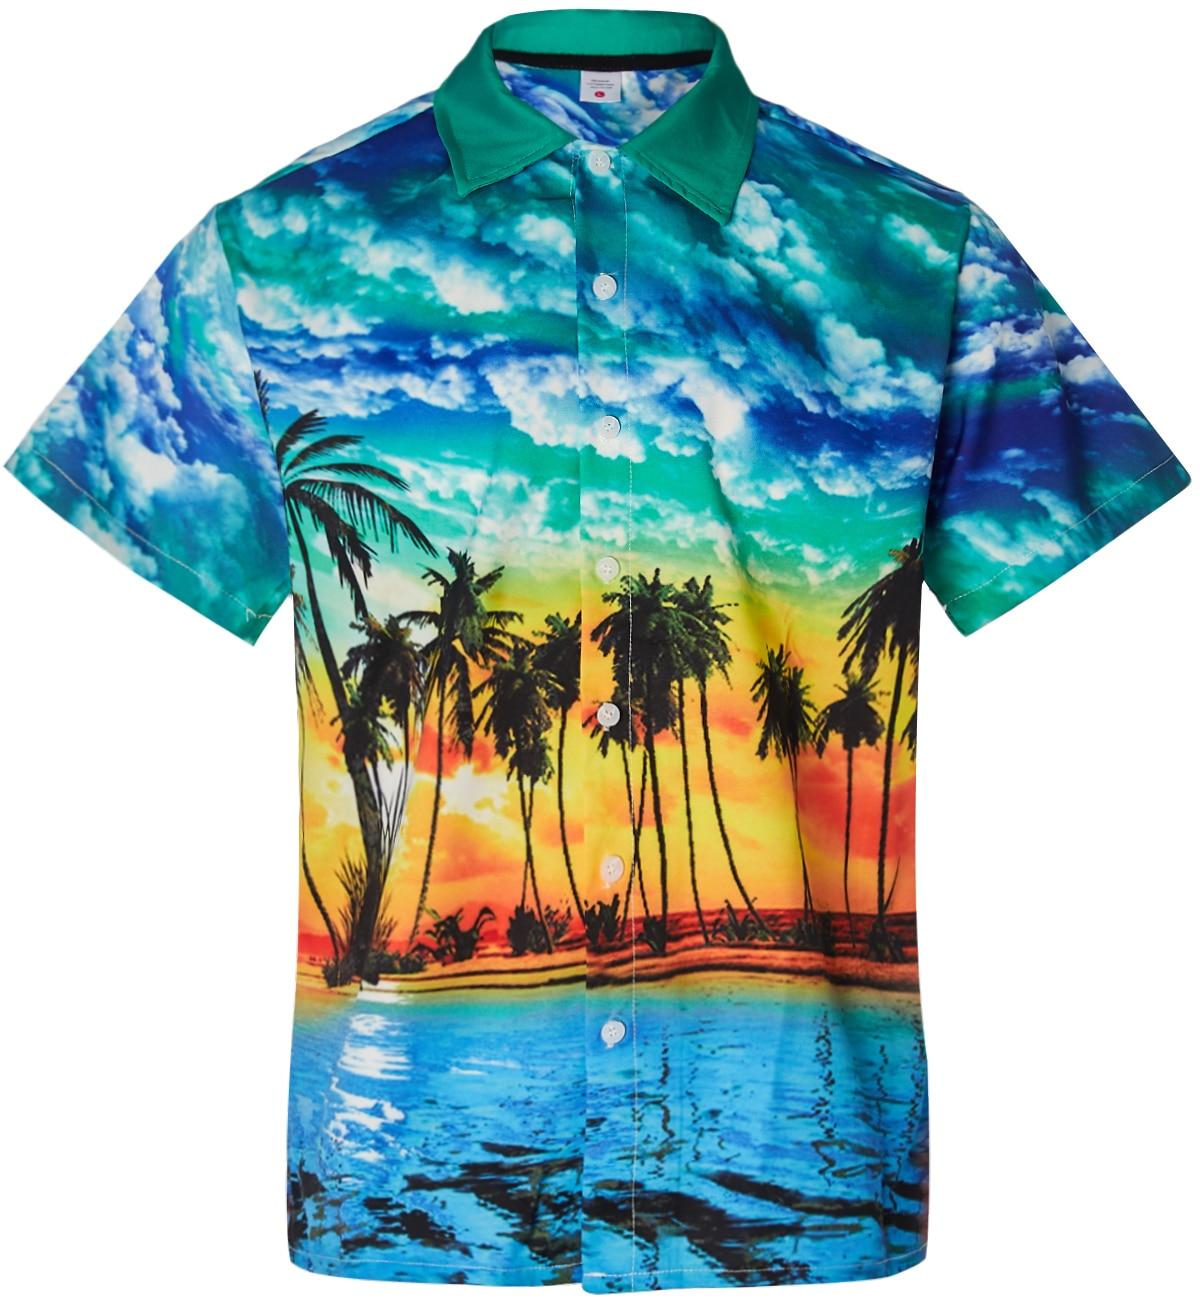 19c80c23c Alisister Mens Hawaiian Shirt Male Casual Camisa Masculina Printed Beach  Shirts Short Sleeve Fashion Brand Chemise Homme Blouse